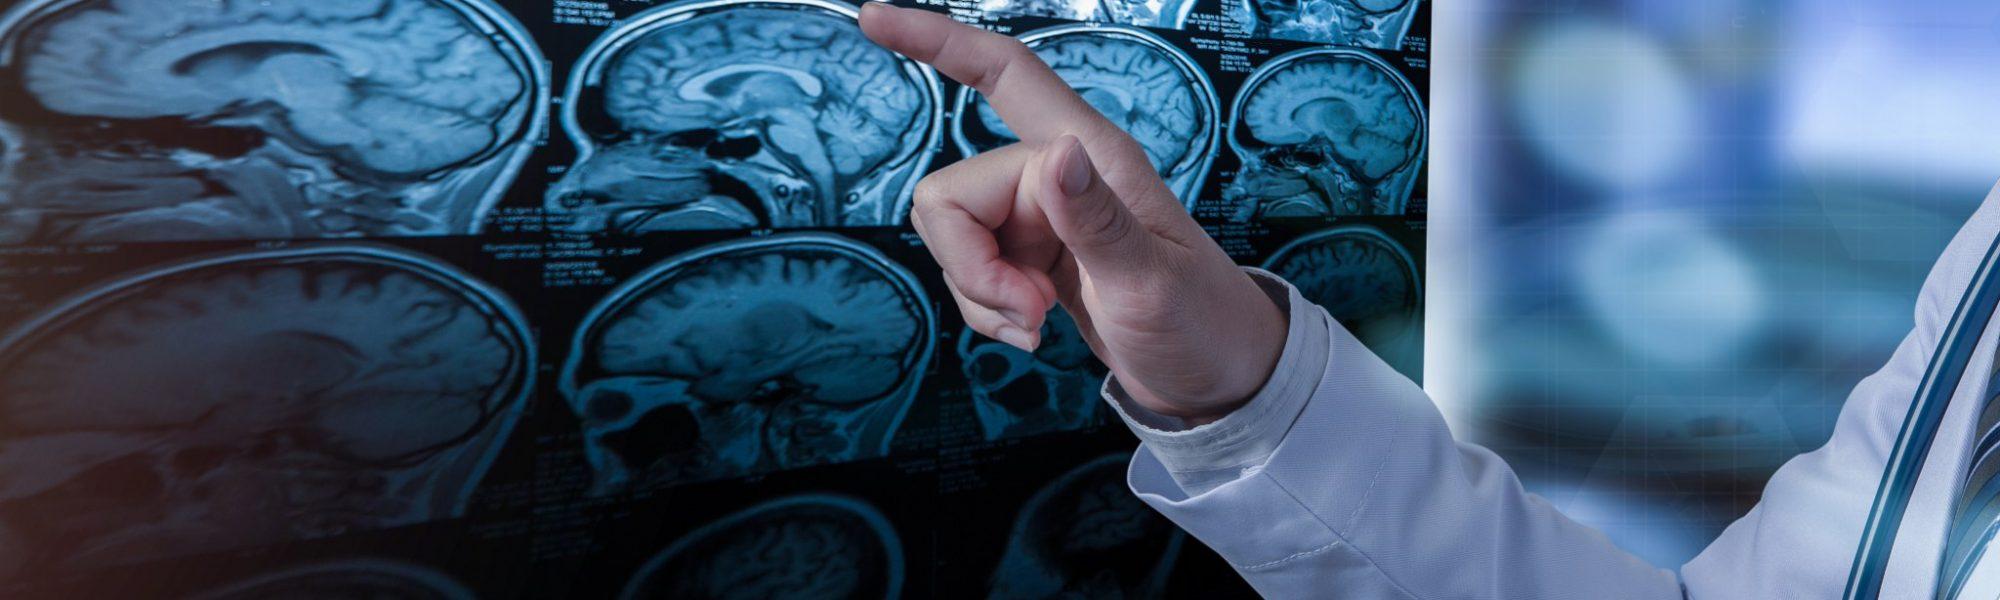 MS-Behandlung in der Neuropraxis Nürnberg